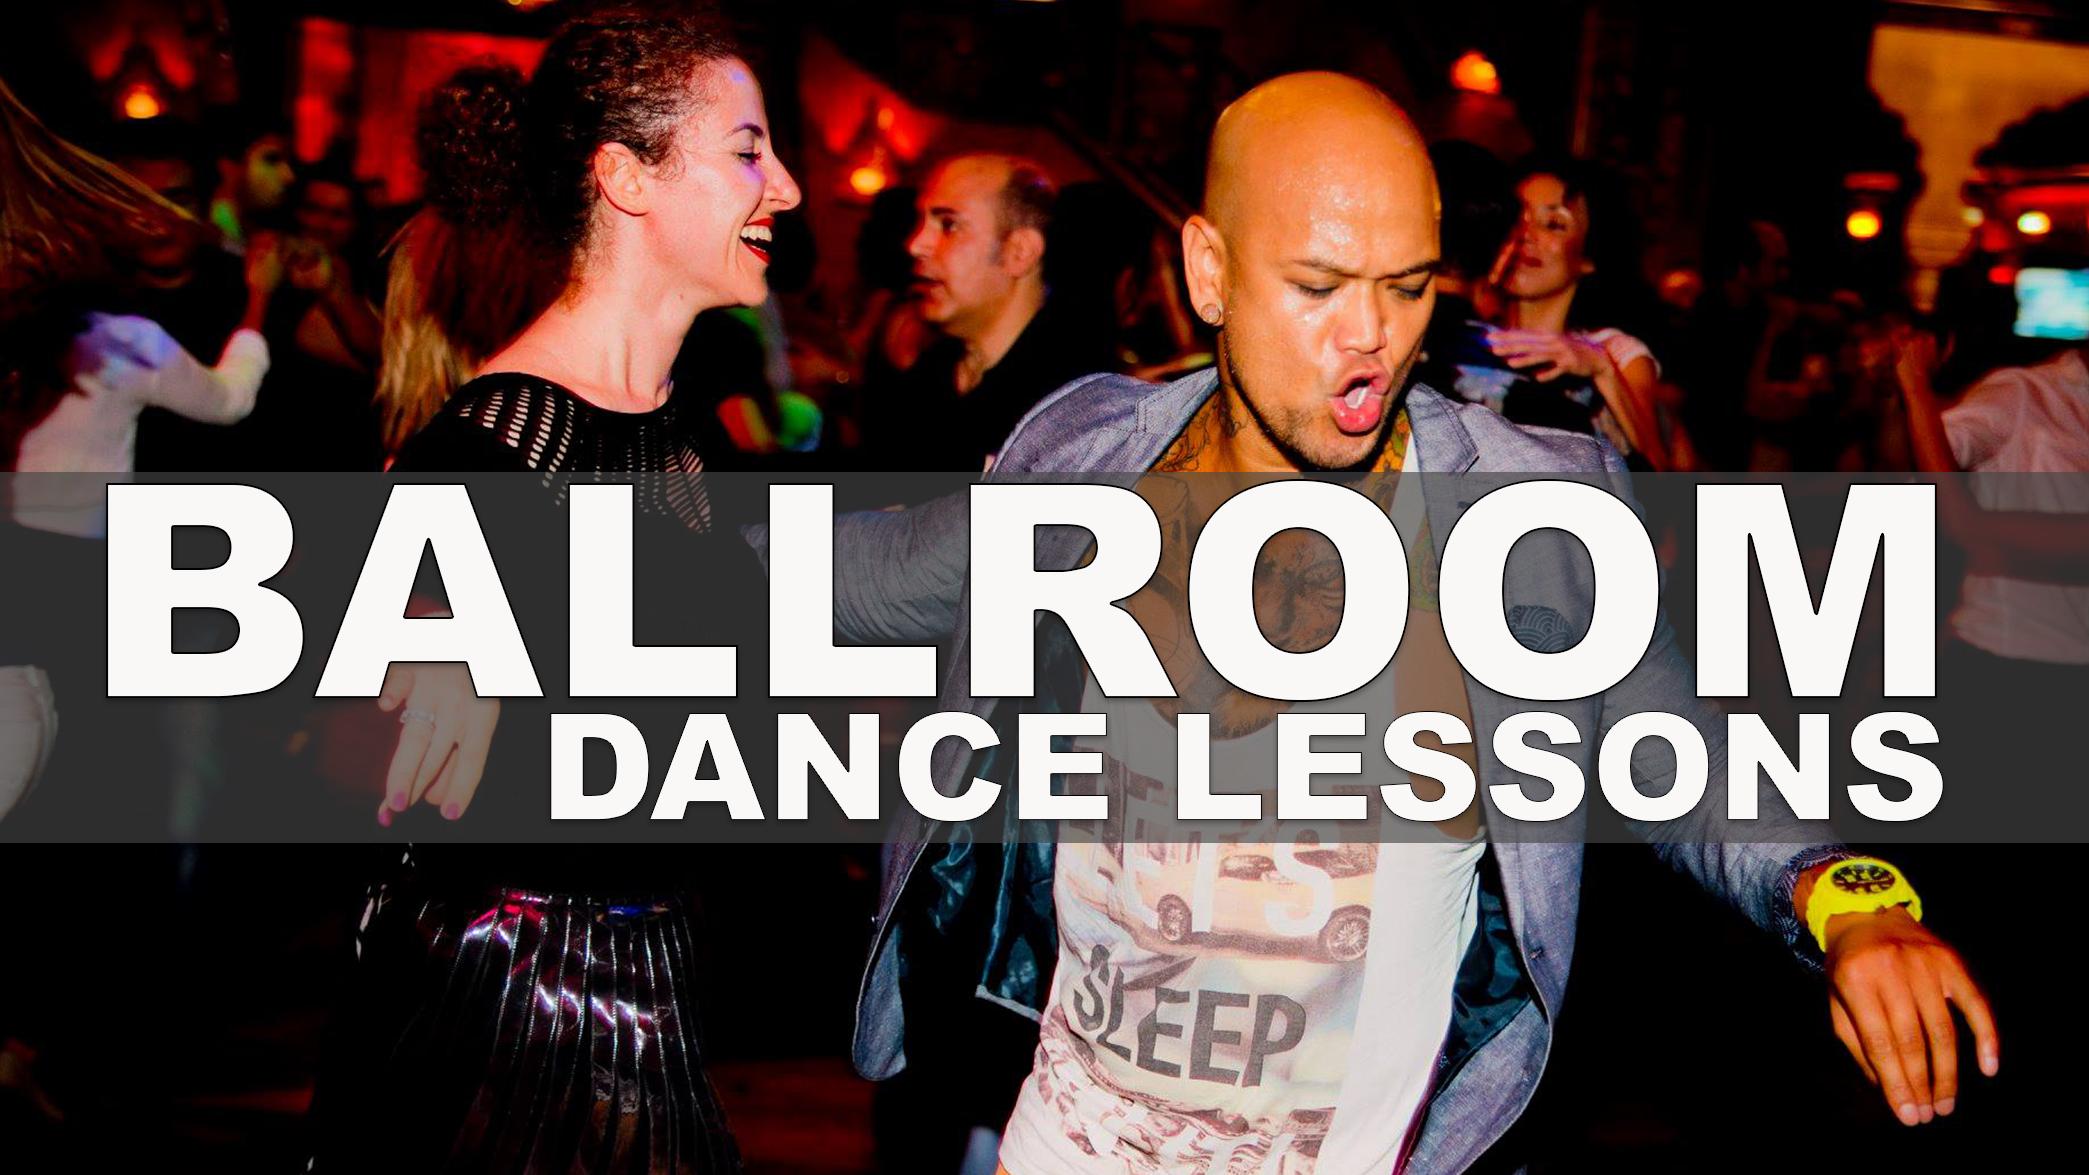 Social Dancing, Ballroom and Dance Lessons in Bartlett